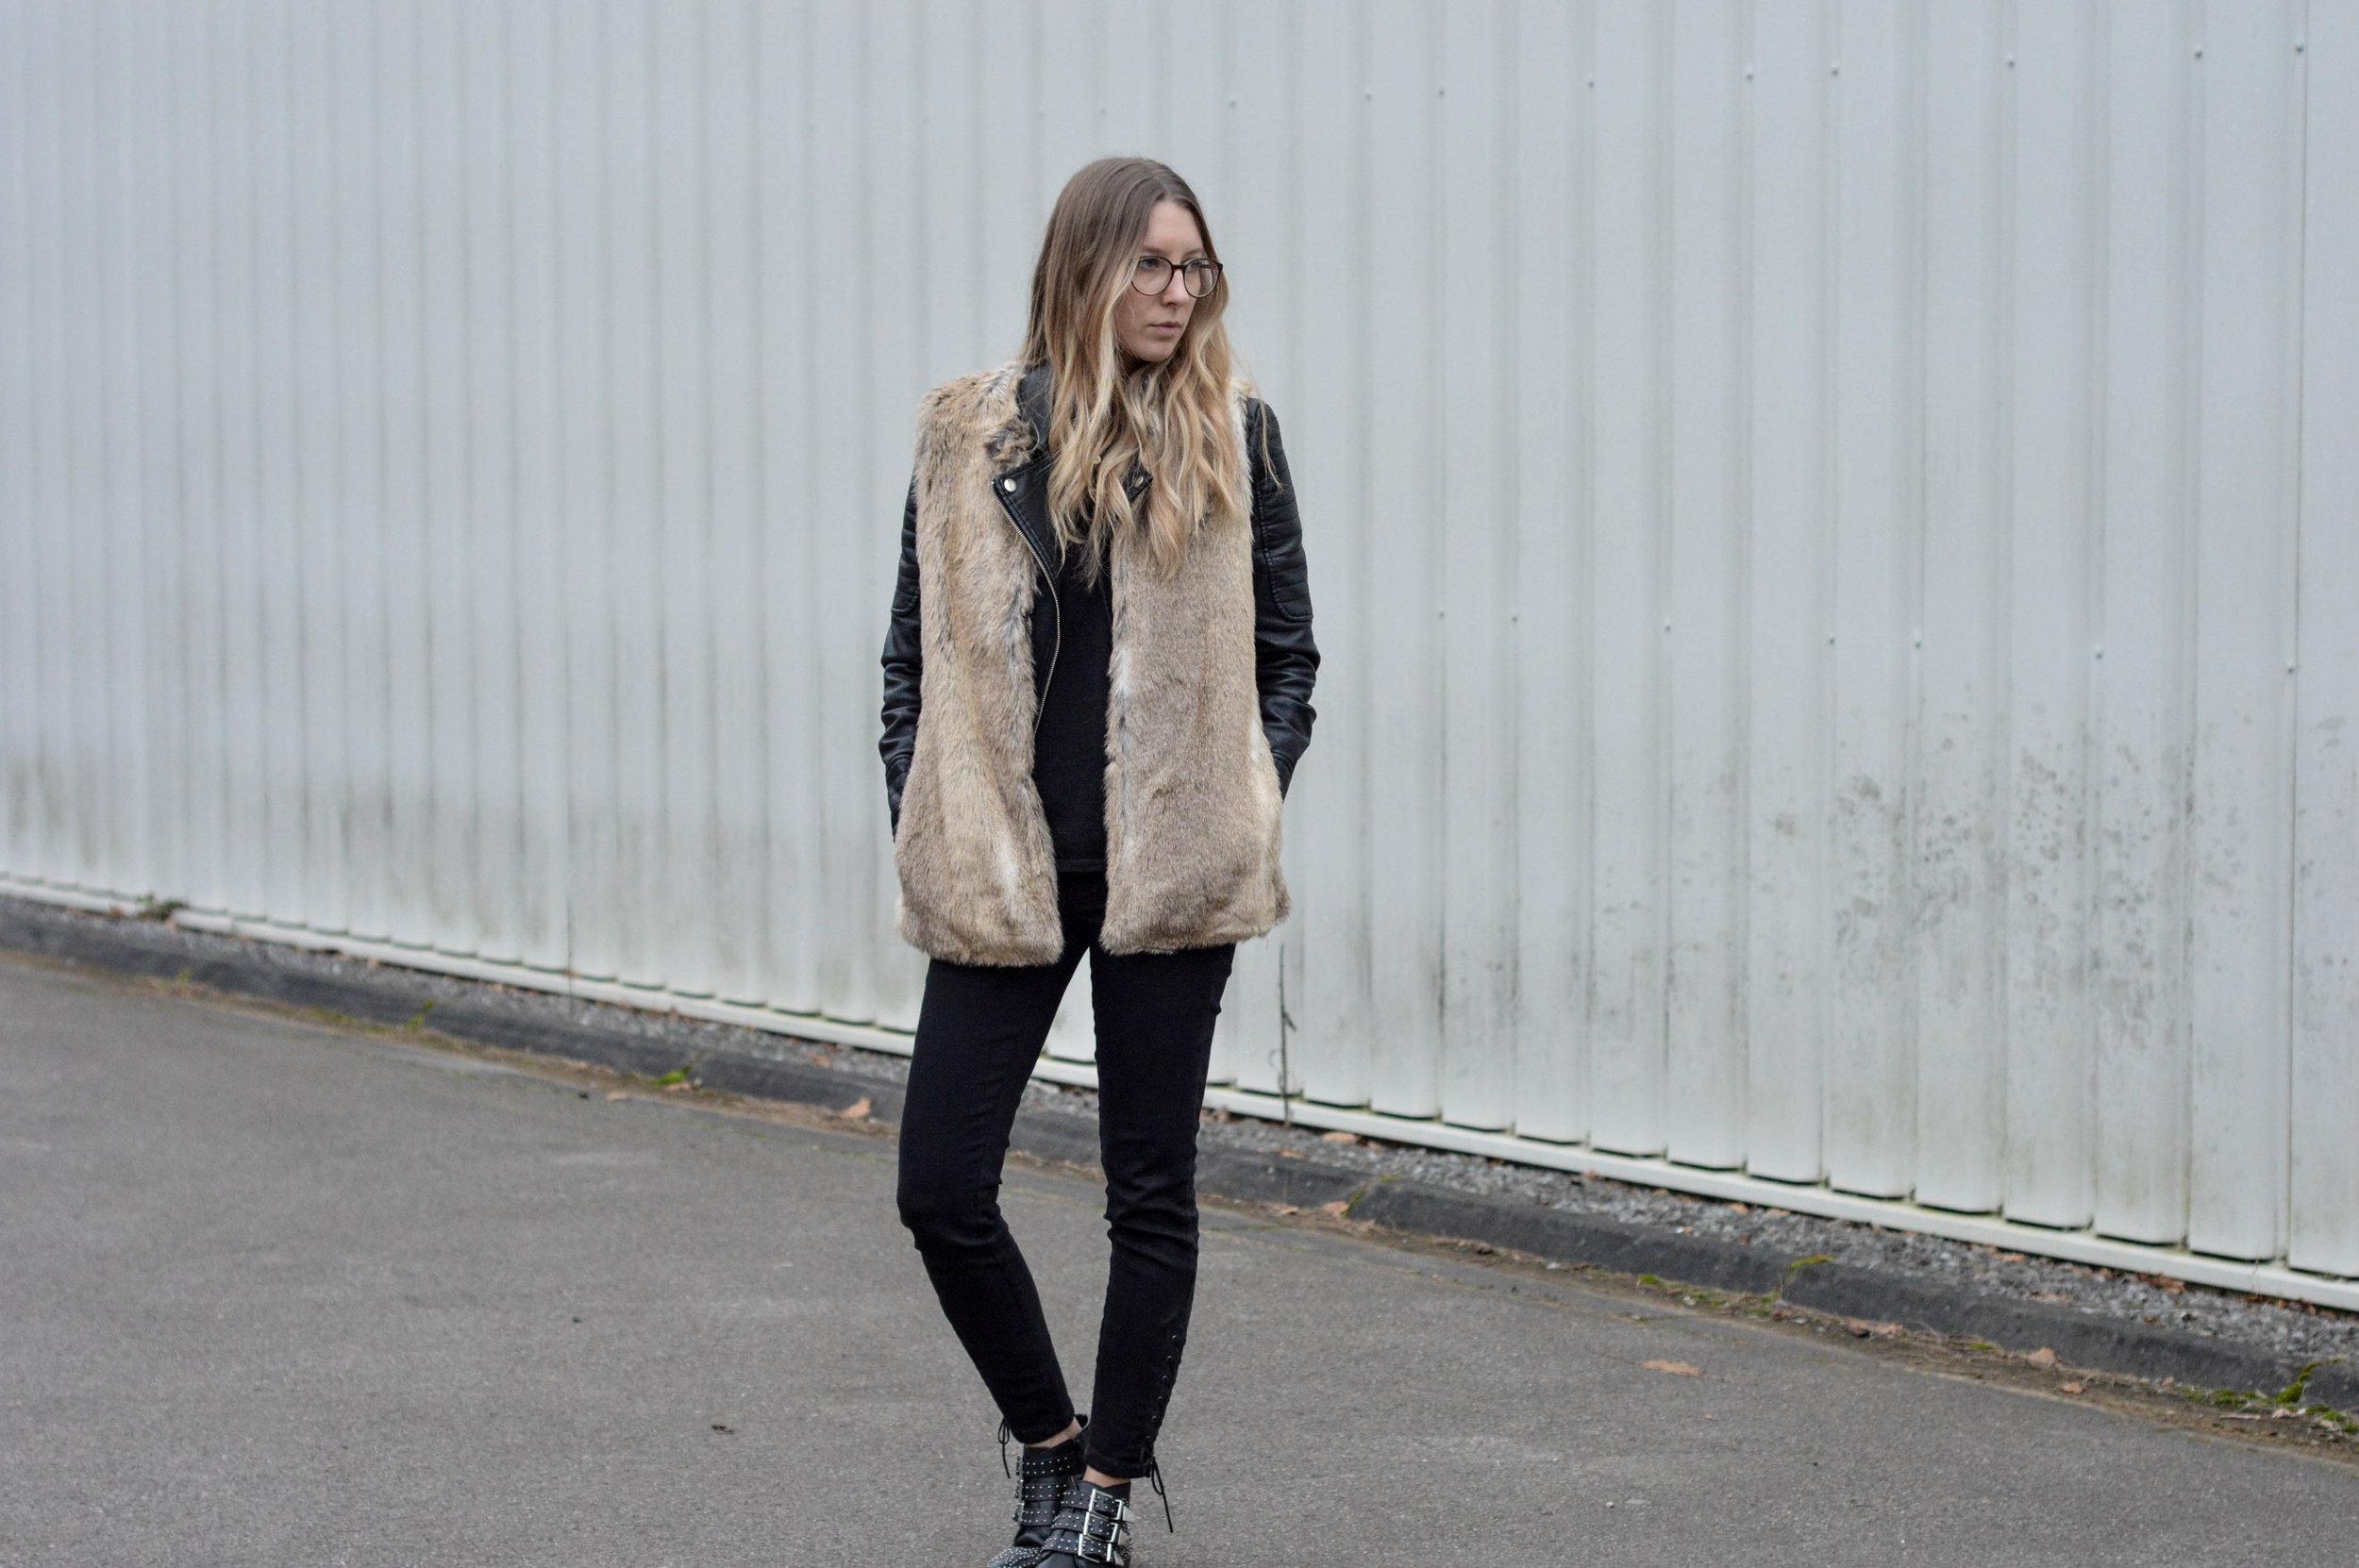 Faux Fur Jacket - OSIARAH.COM (2 of 17).jpg